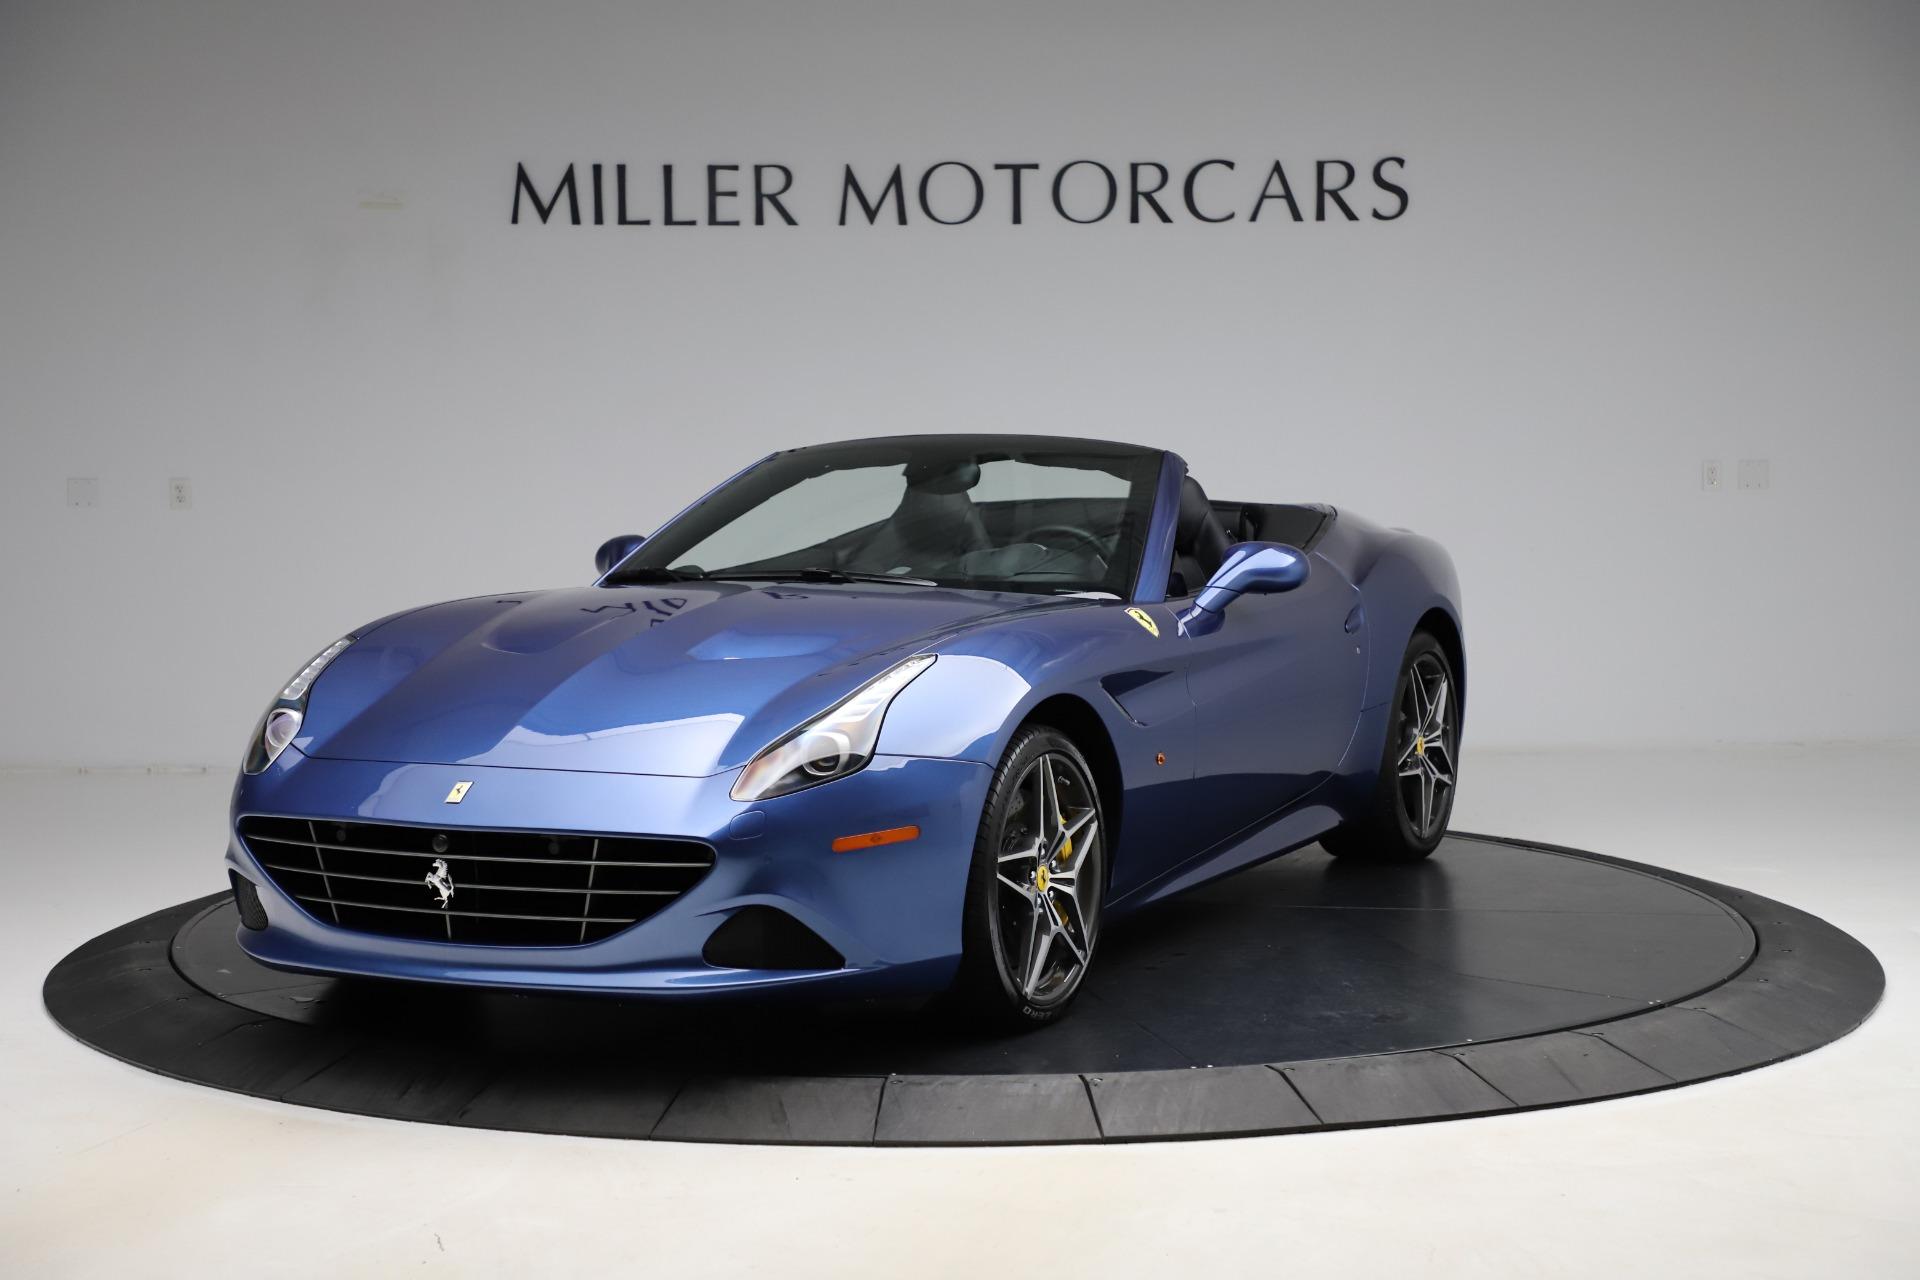 Used 2018 Ferrari California T for sale $185,900 at Maserati of Greenwich in Greenwich CT 06830 1